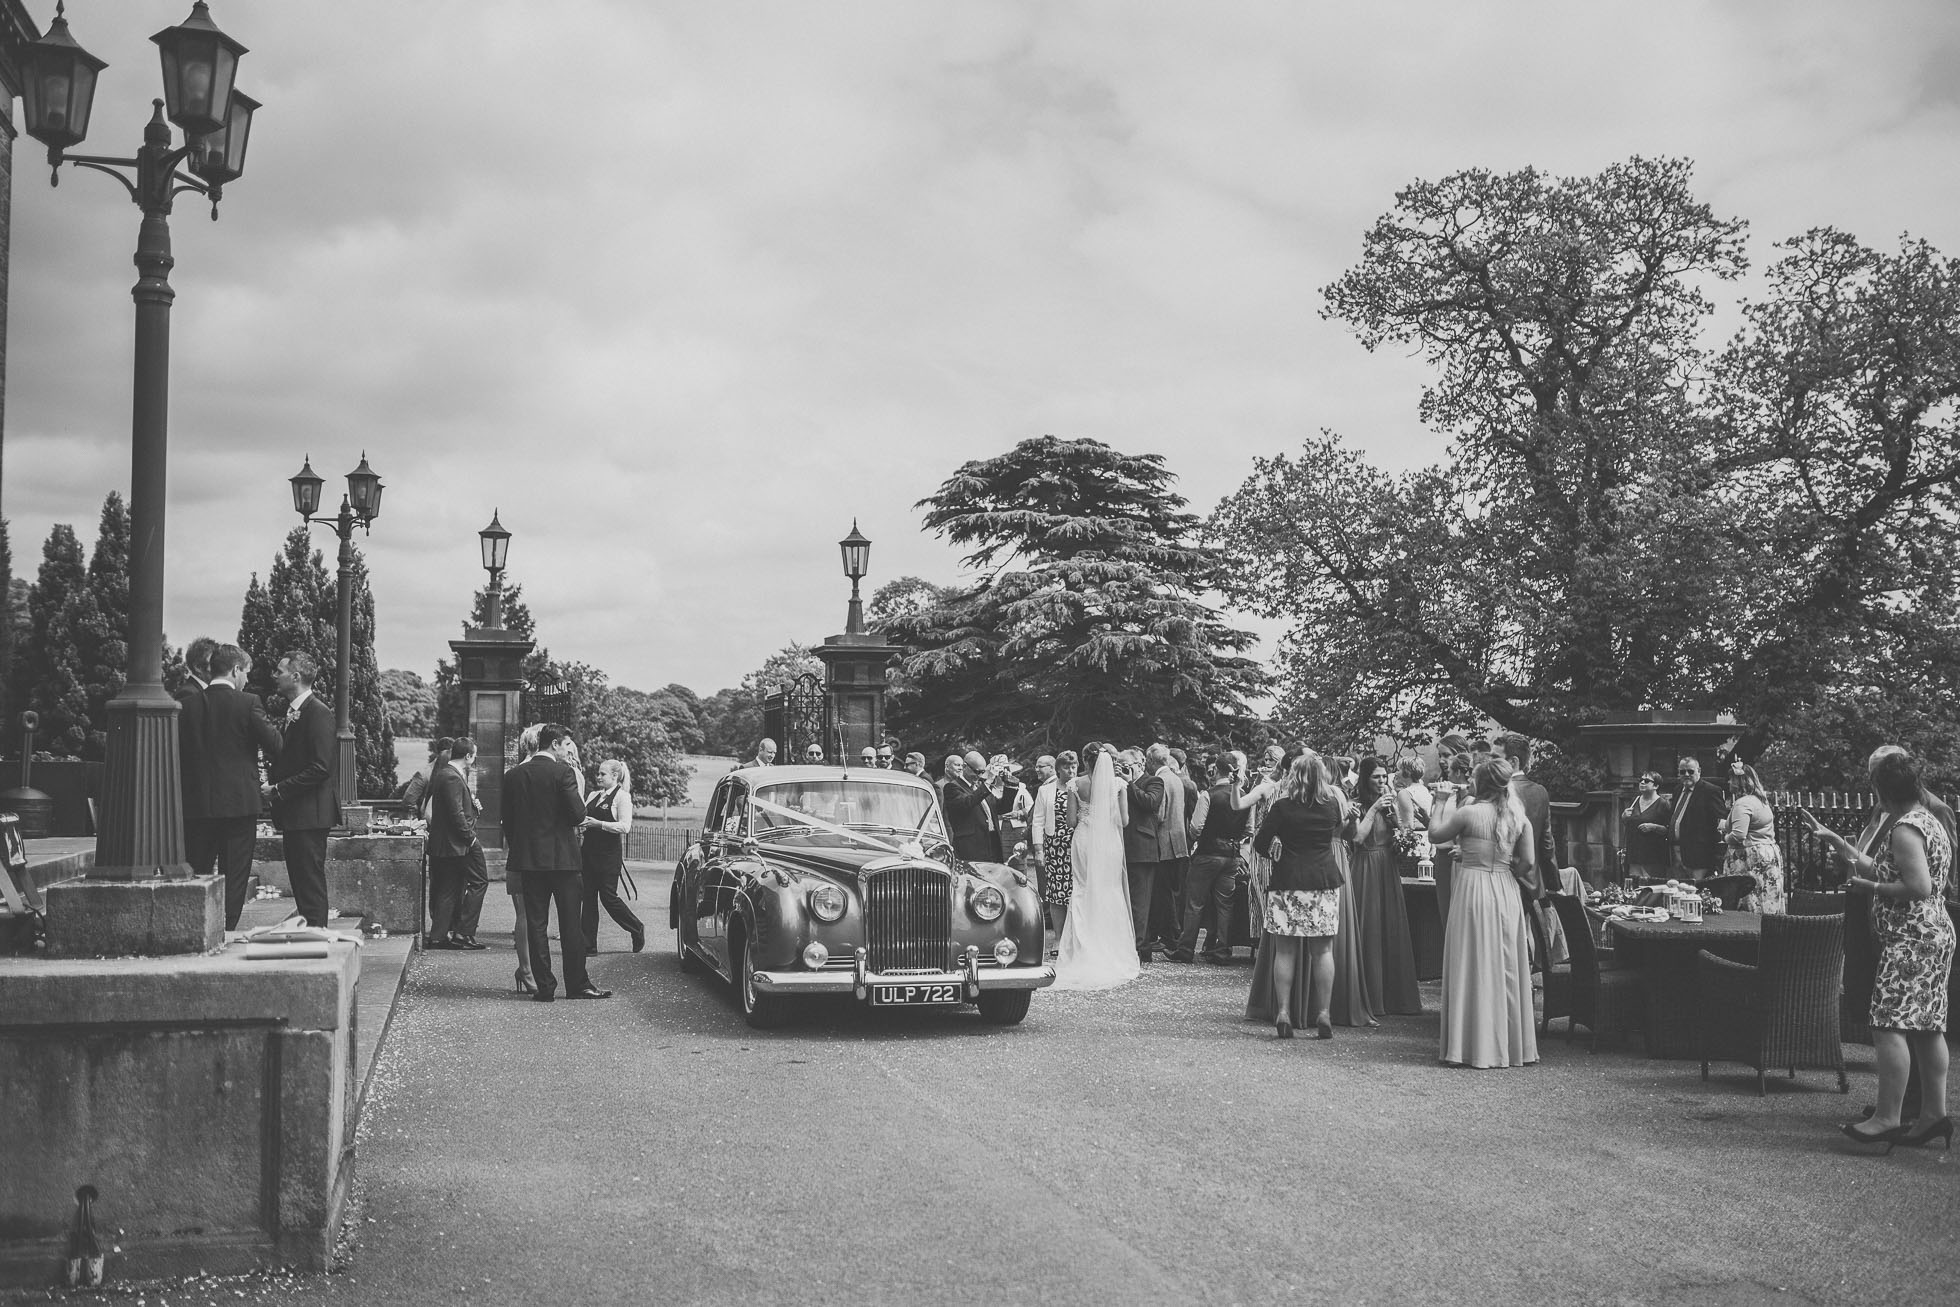 denton-hall-wedding-photographer-43.jpg